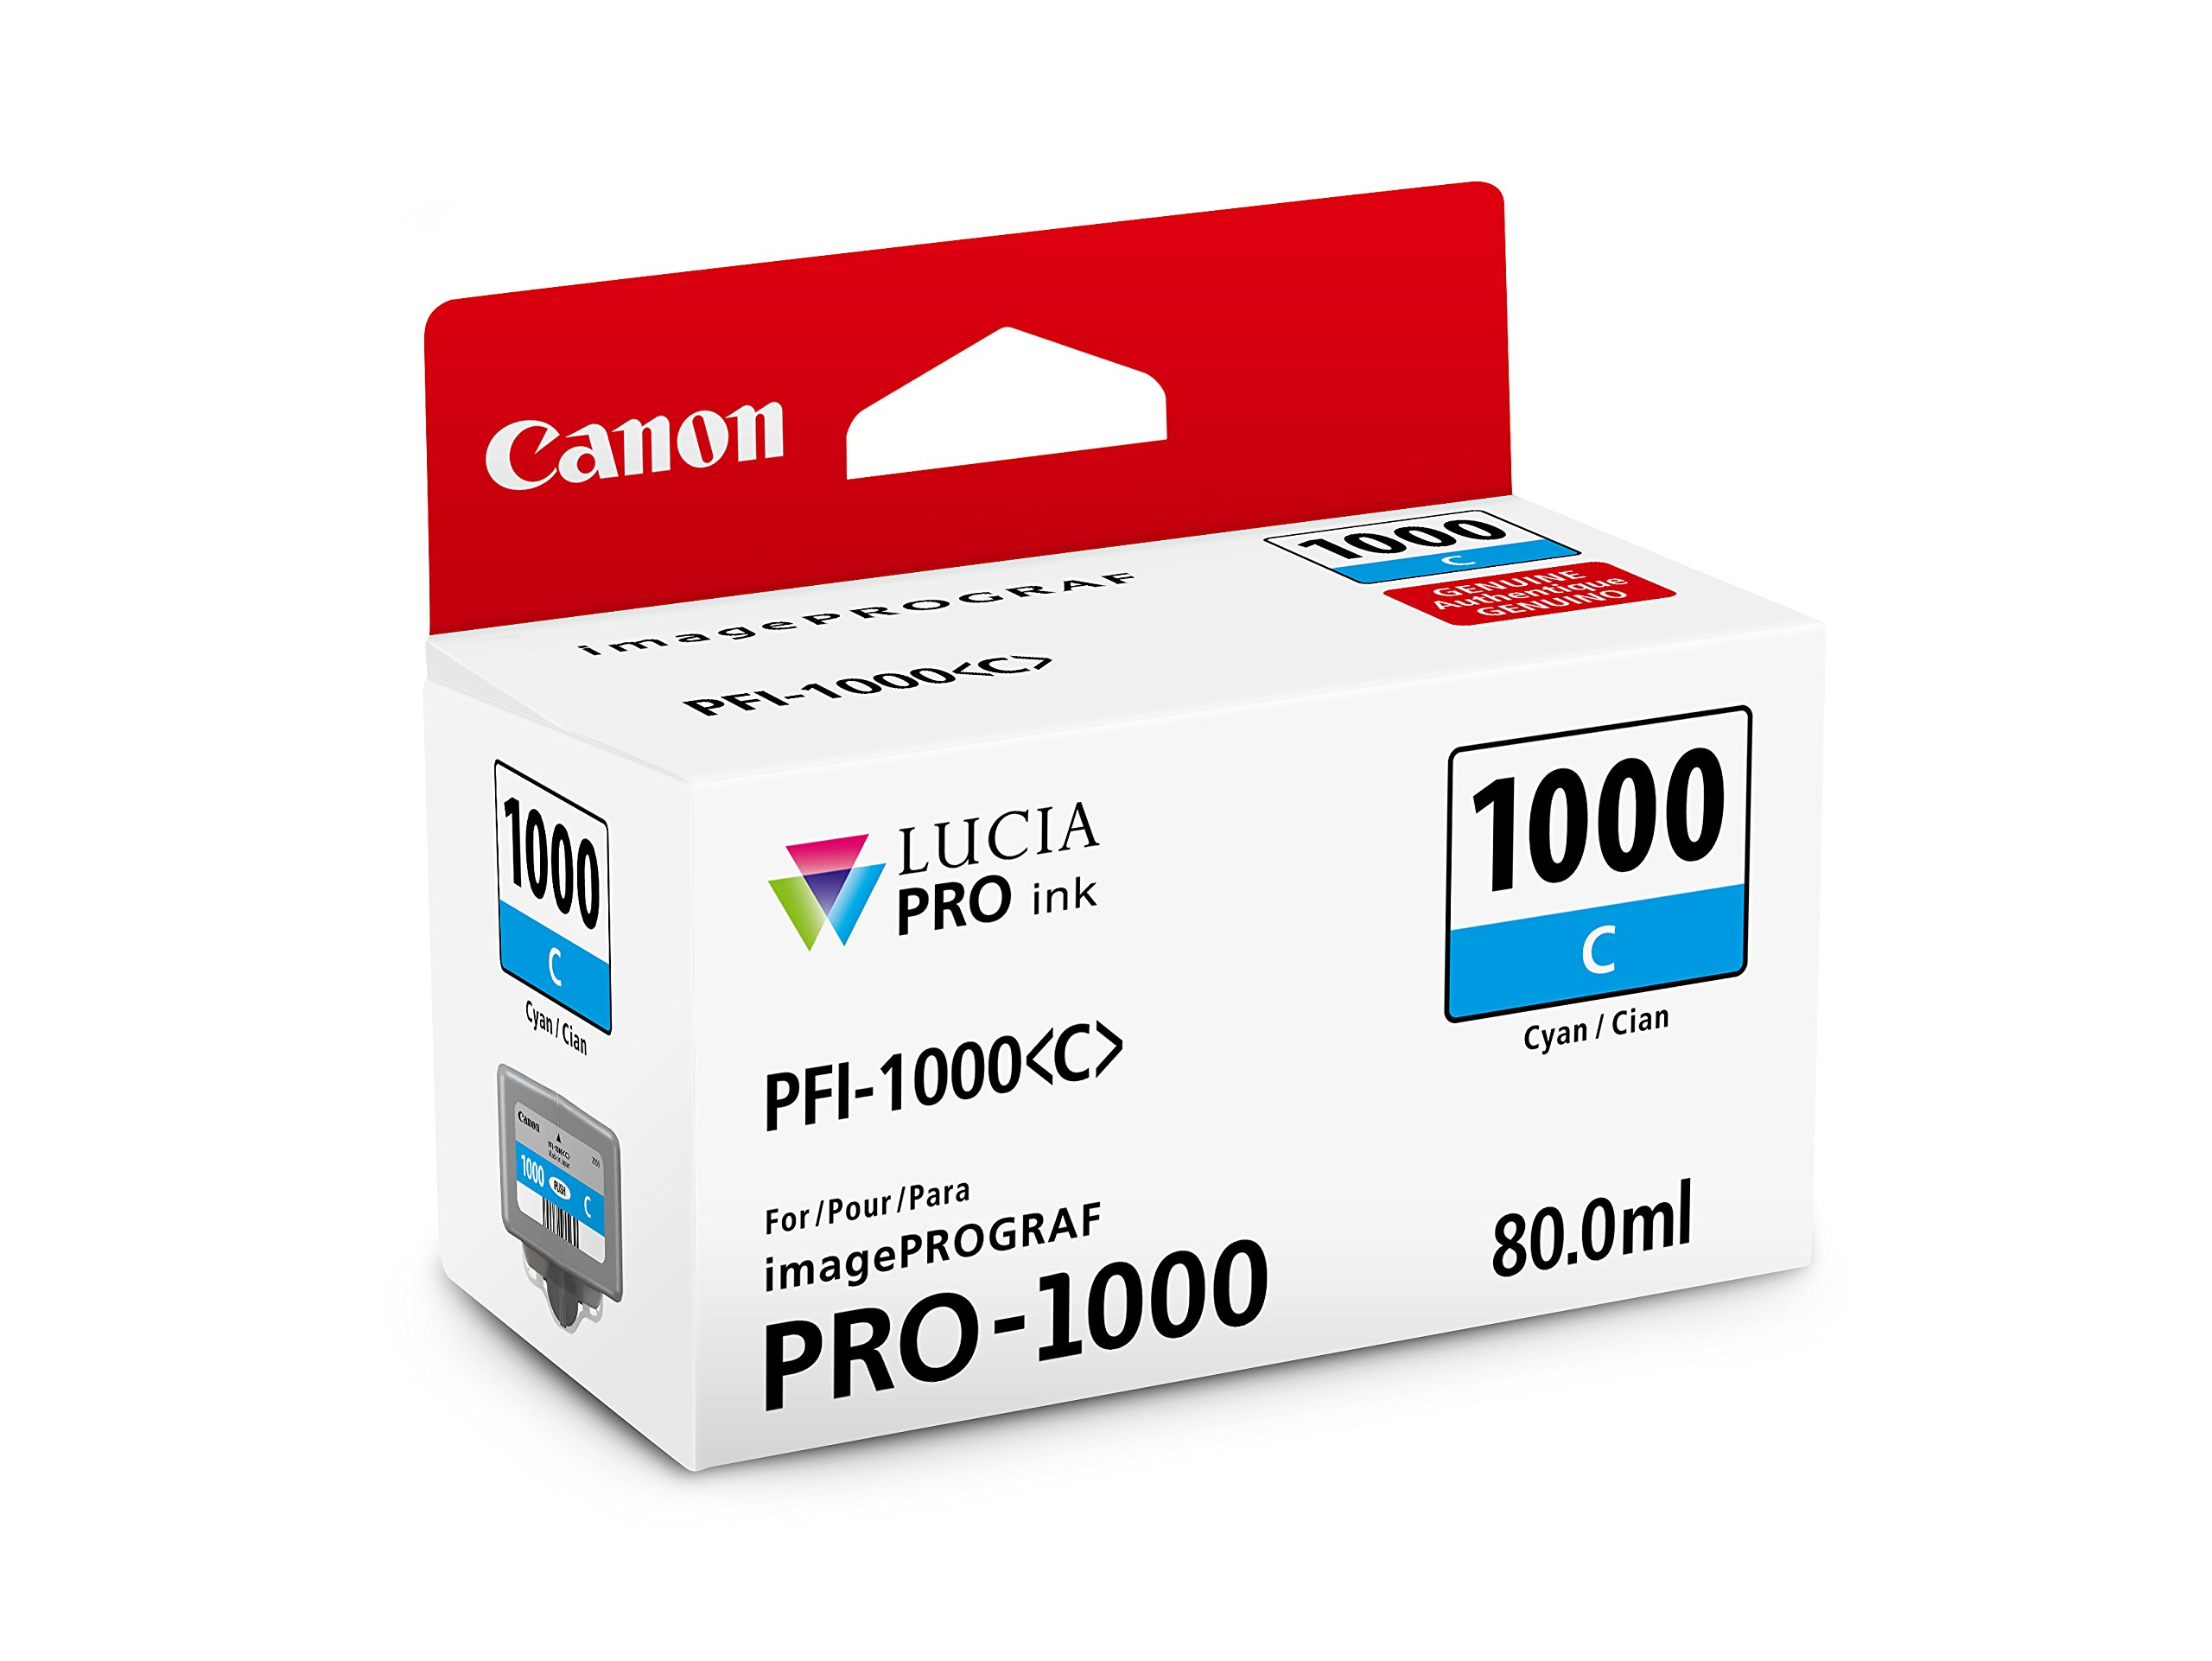 CanonInk LUCIA PRO PFI-1000 Cyan Individual Ink Tank